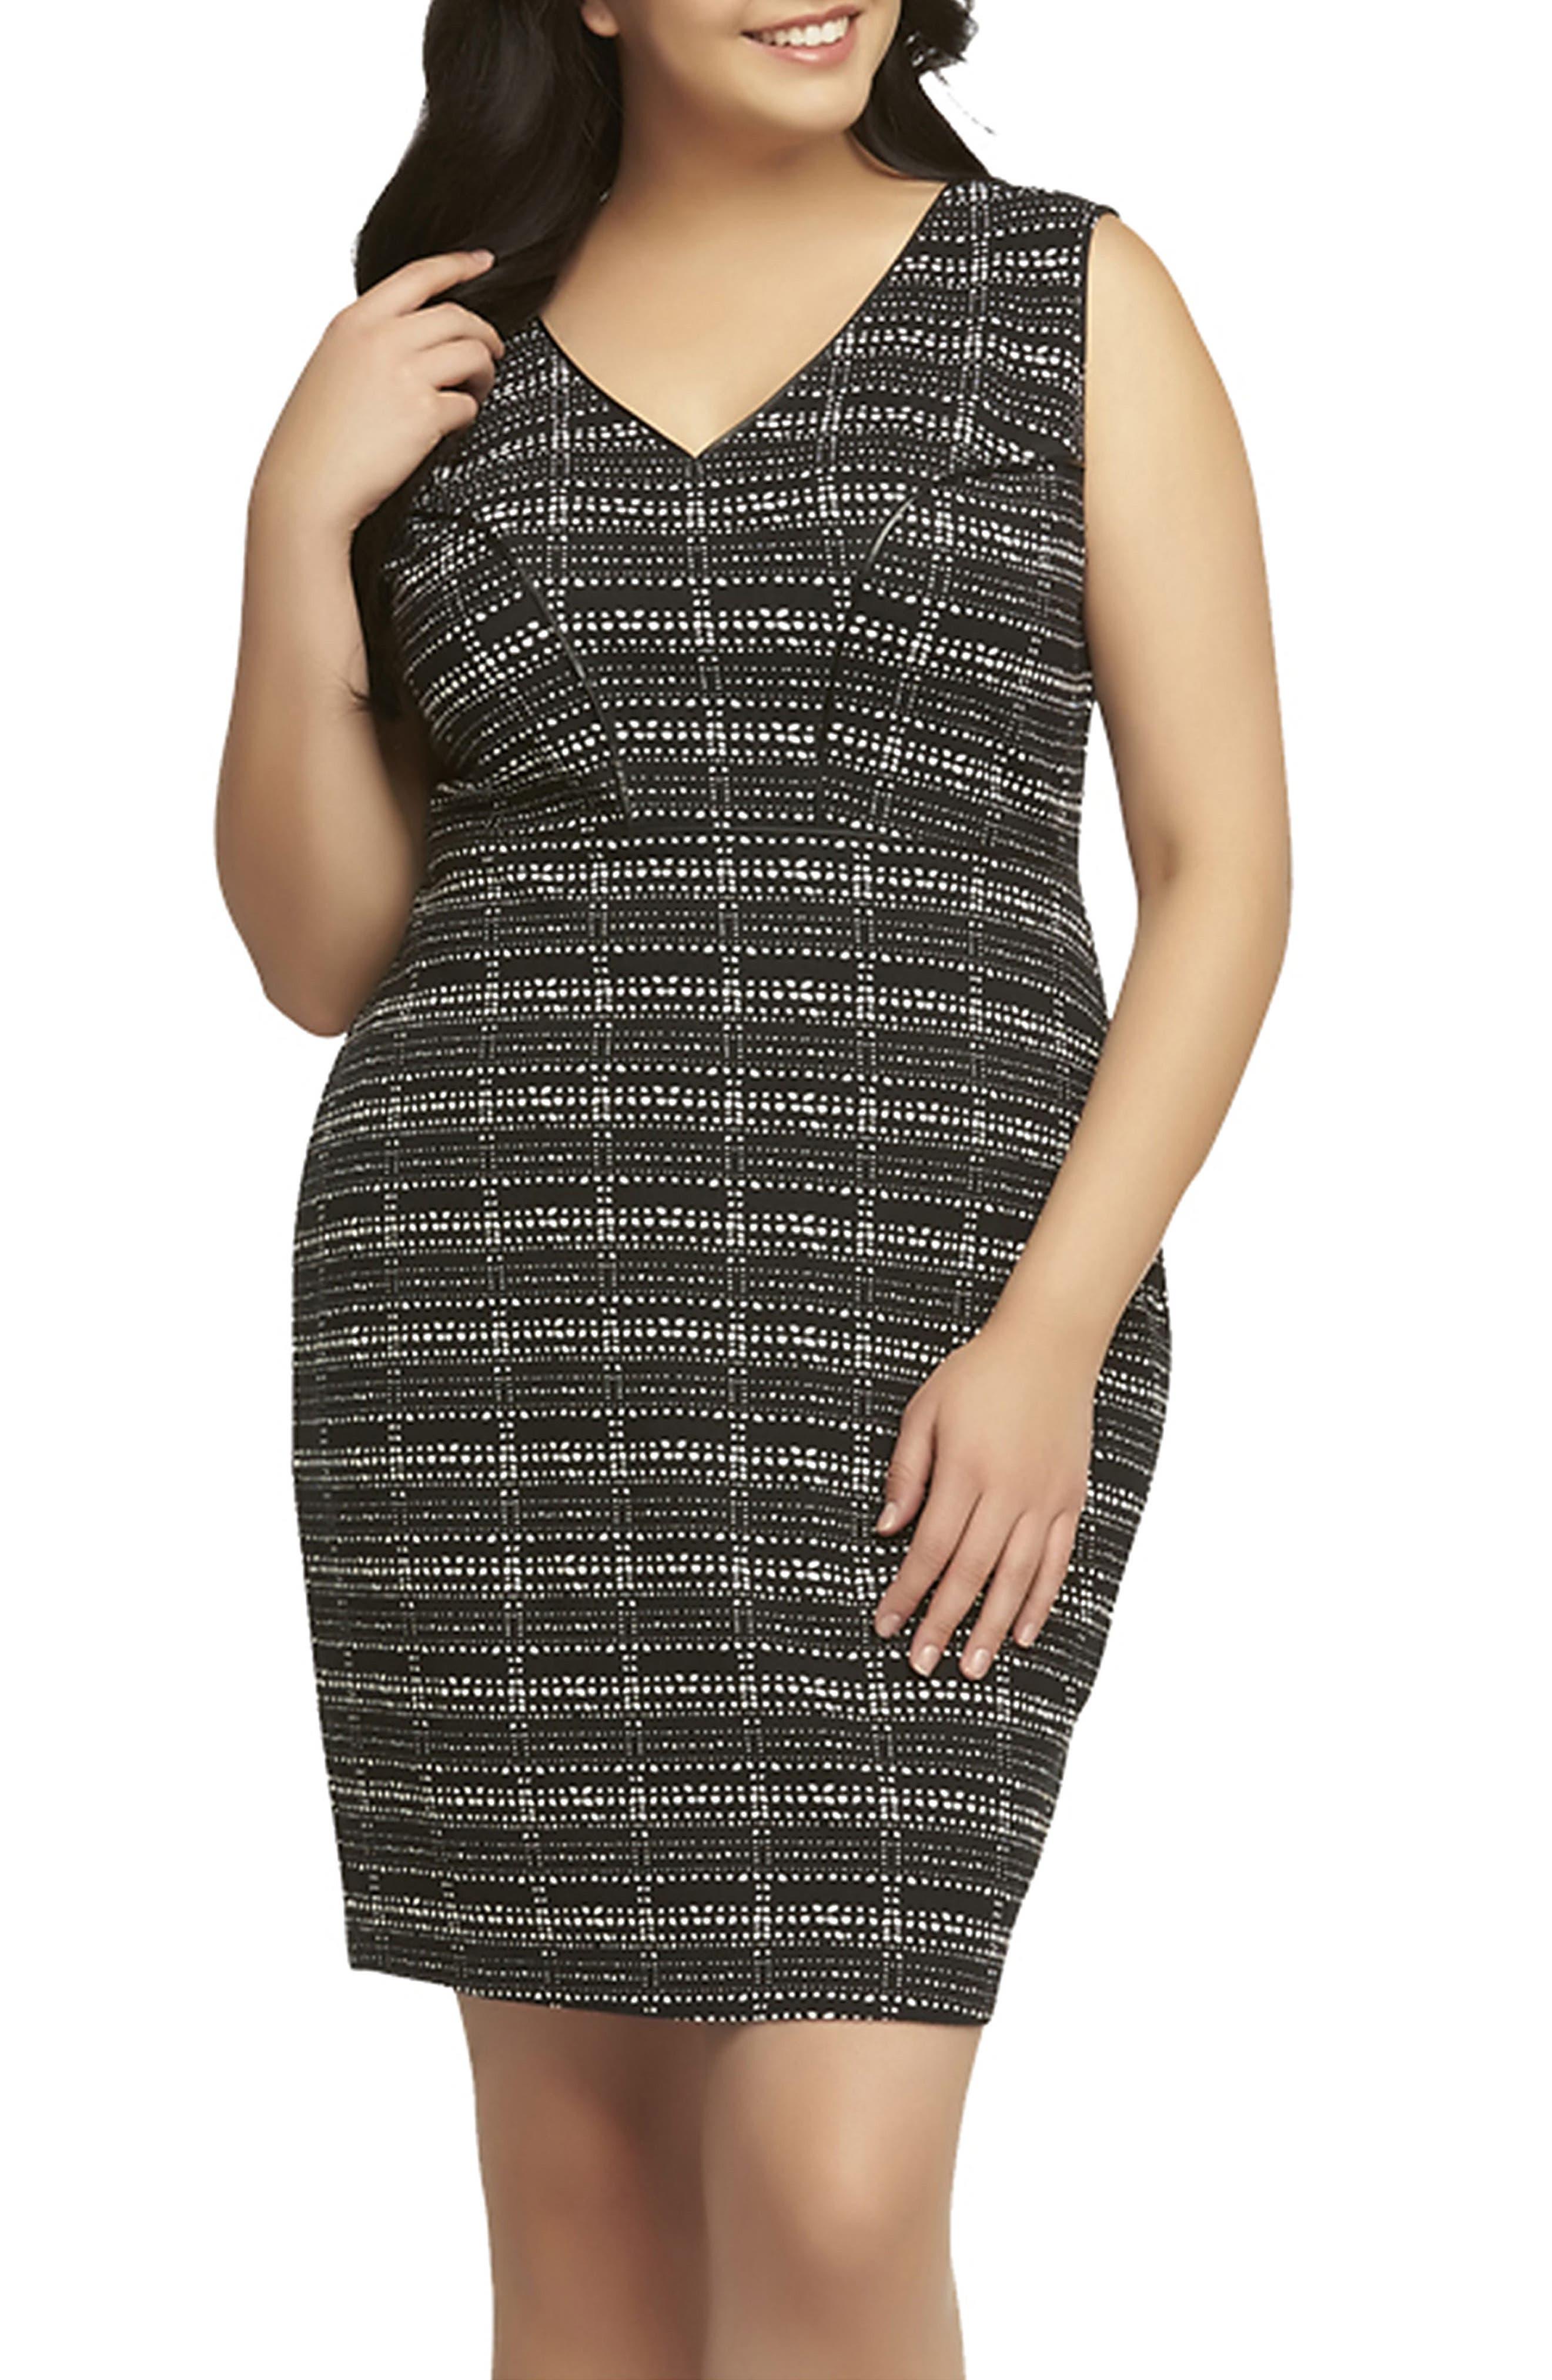 Main Image - Tart 'Viera' Piped Detail V-Neck Sheath Dress (Plus Size)